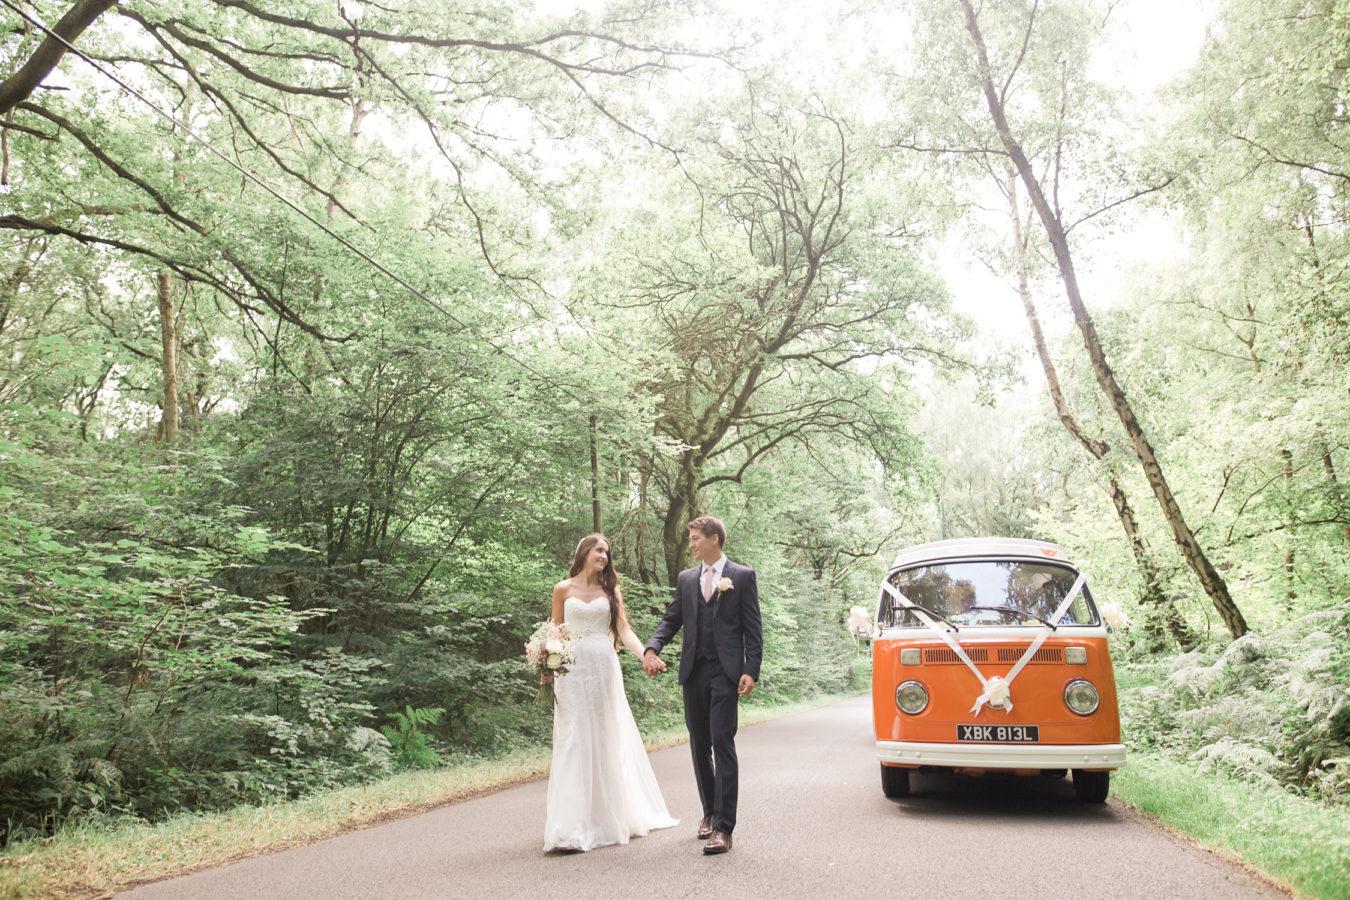 Wedding Hire VW Camper Van Wedding Transport Bride & Groom